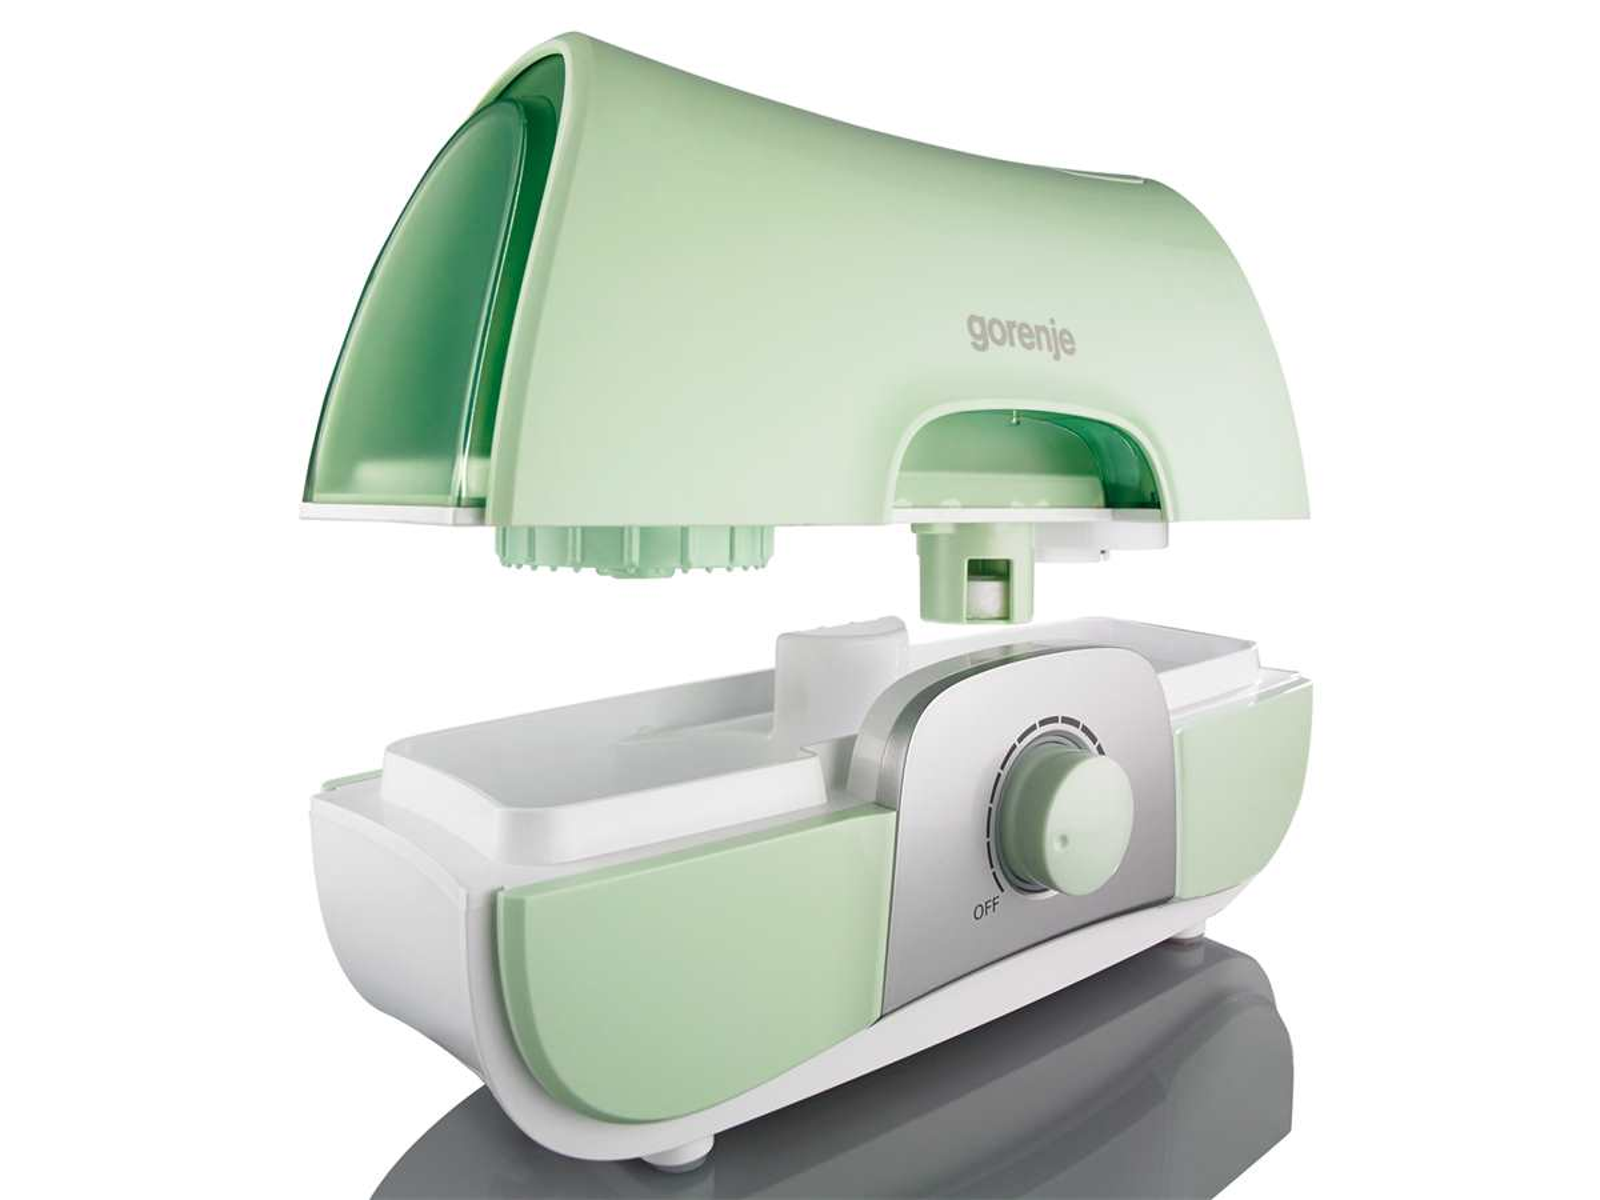 Gorenje H17G Ultraschall-Luftbefeuchter